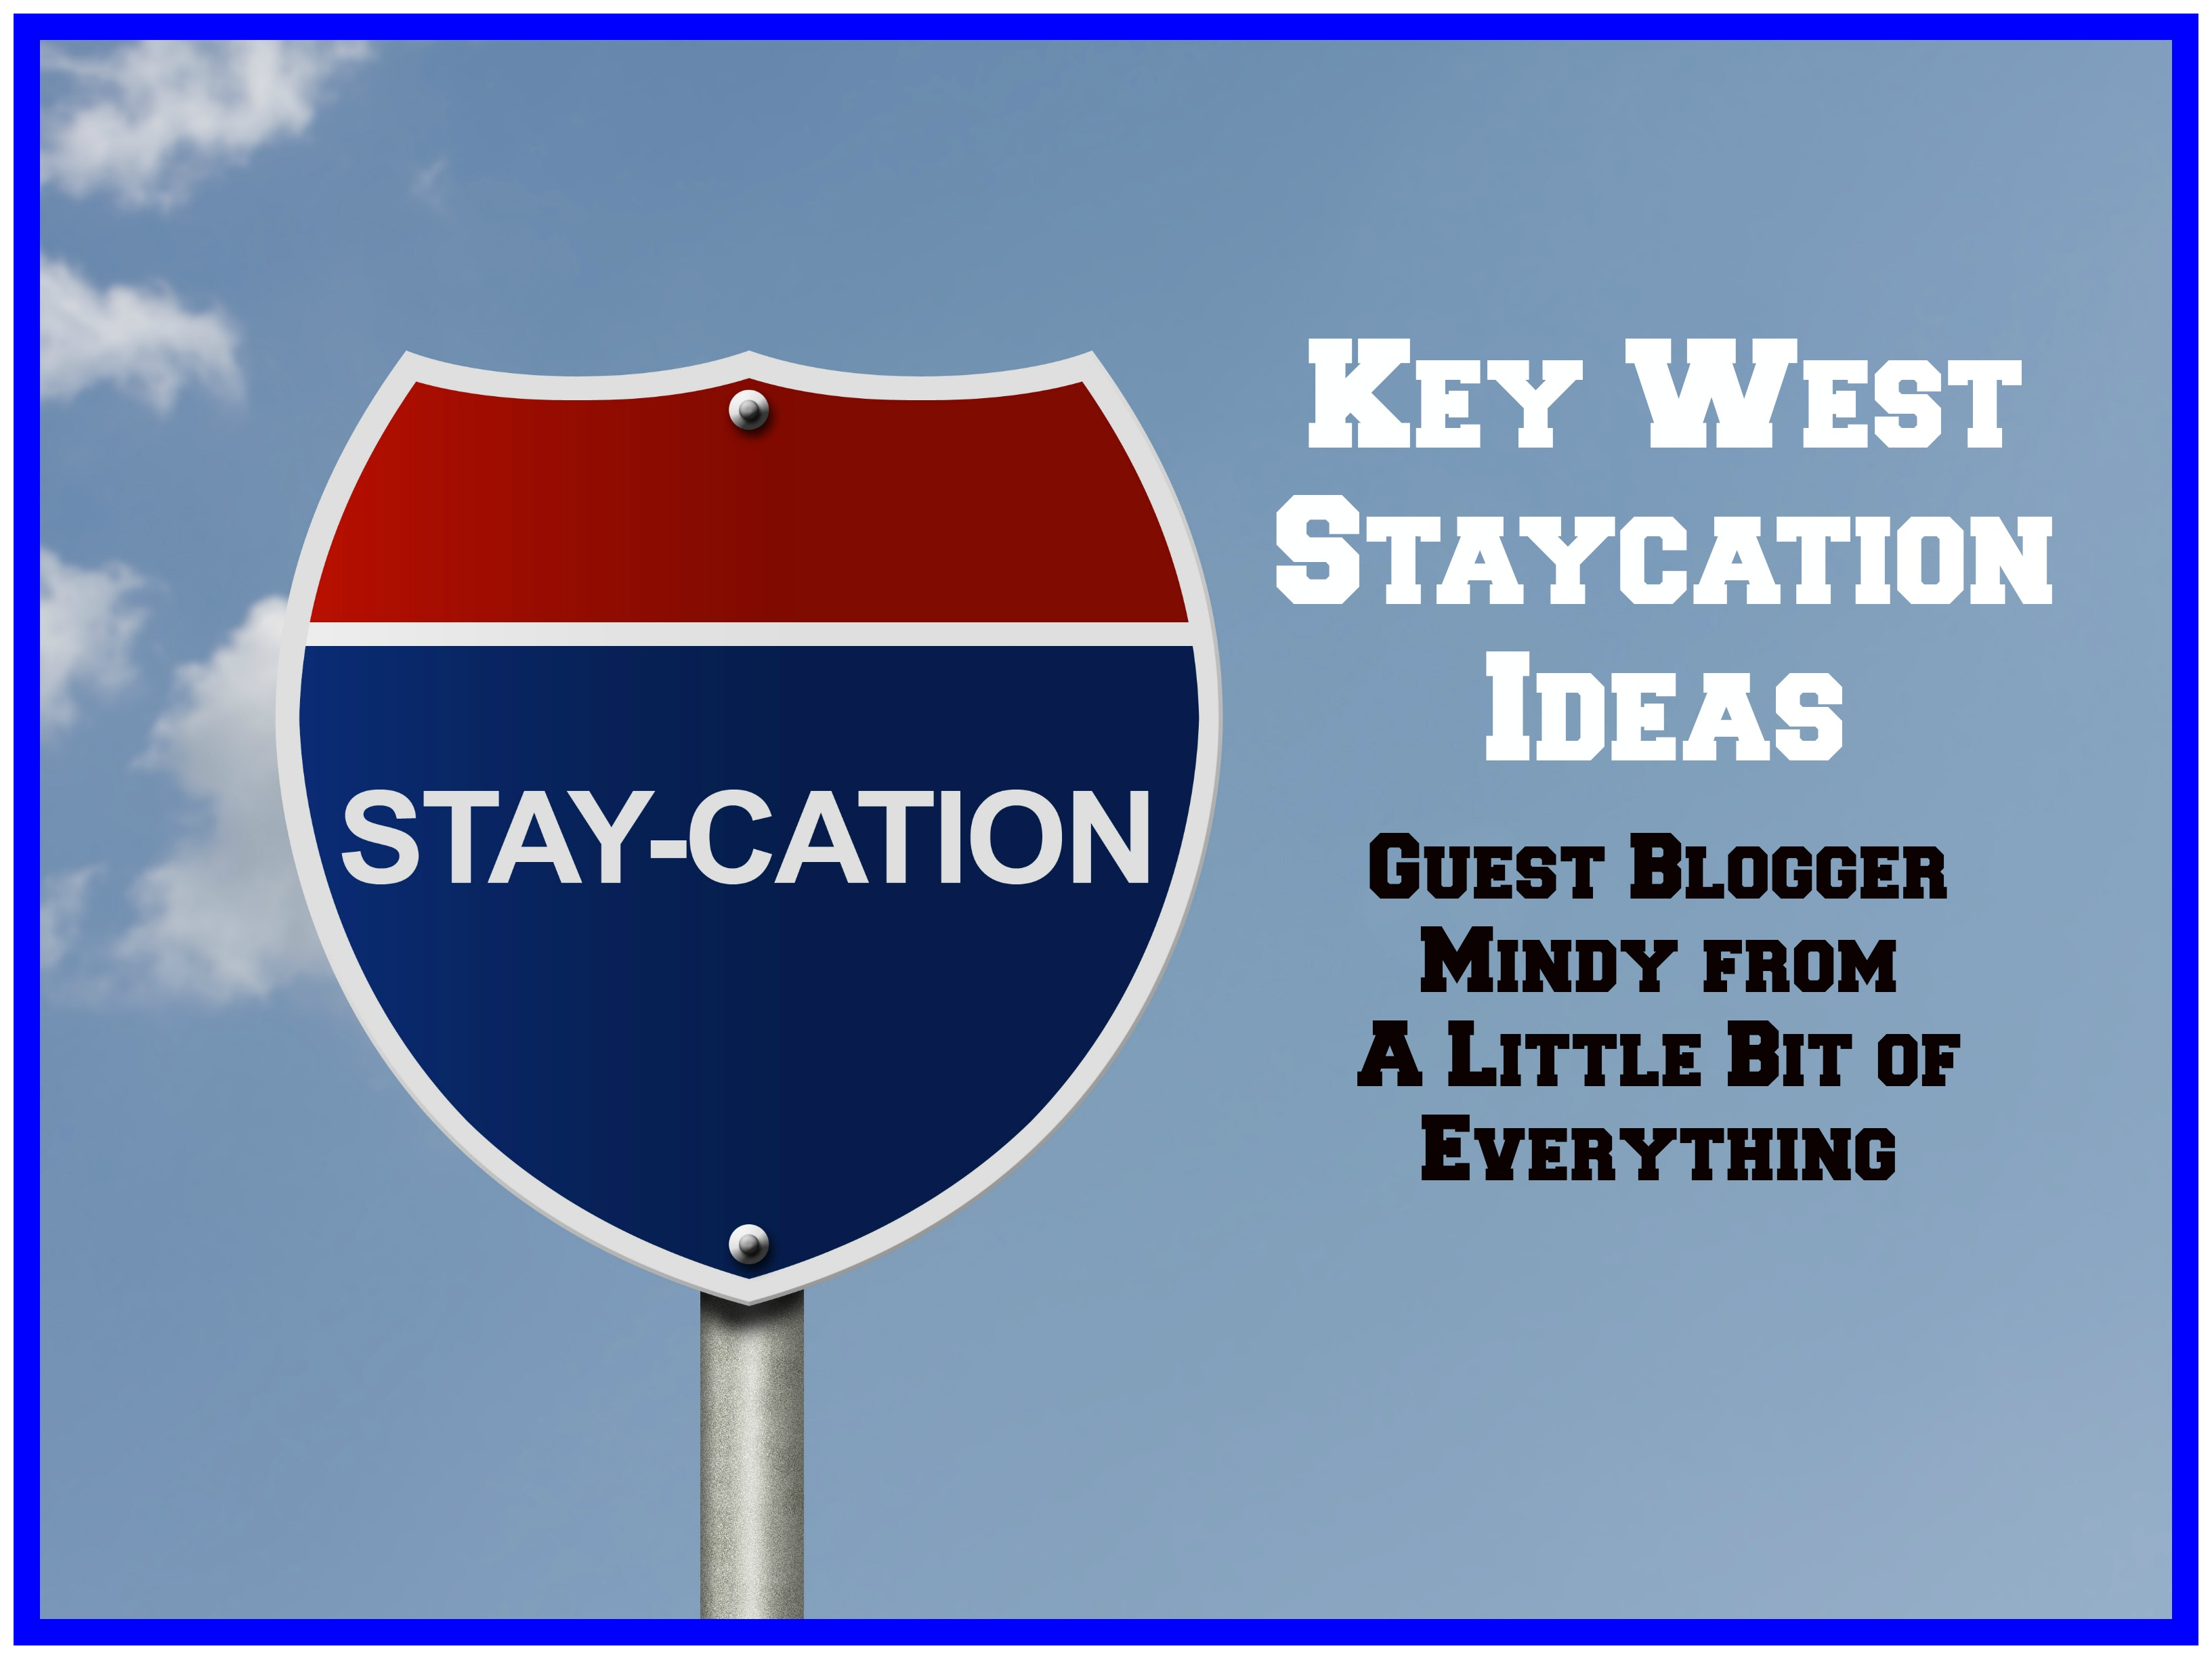 Key West Staycation Ideas